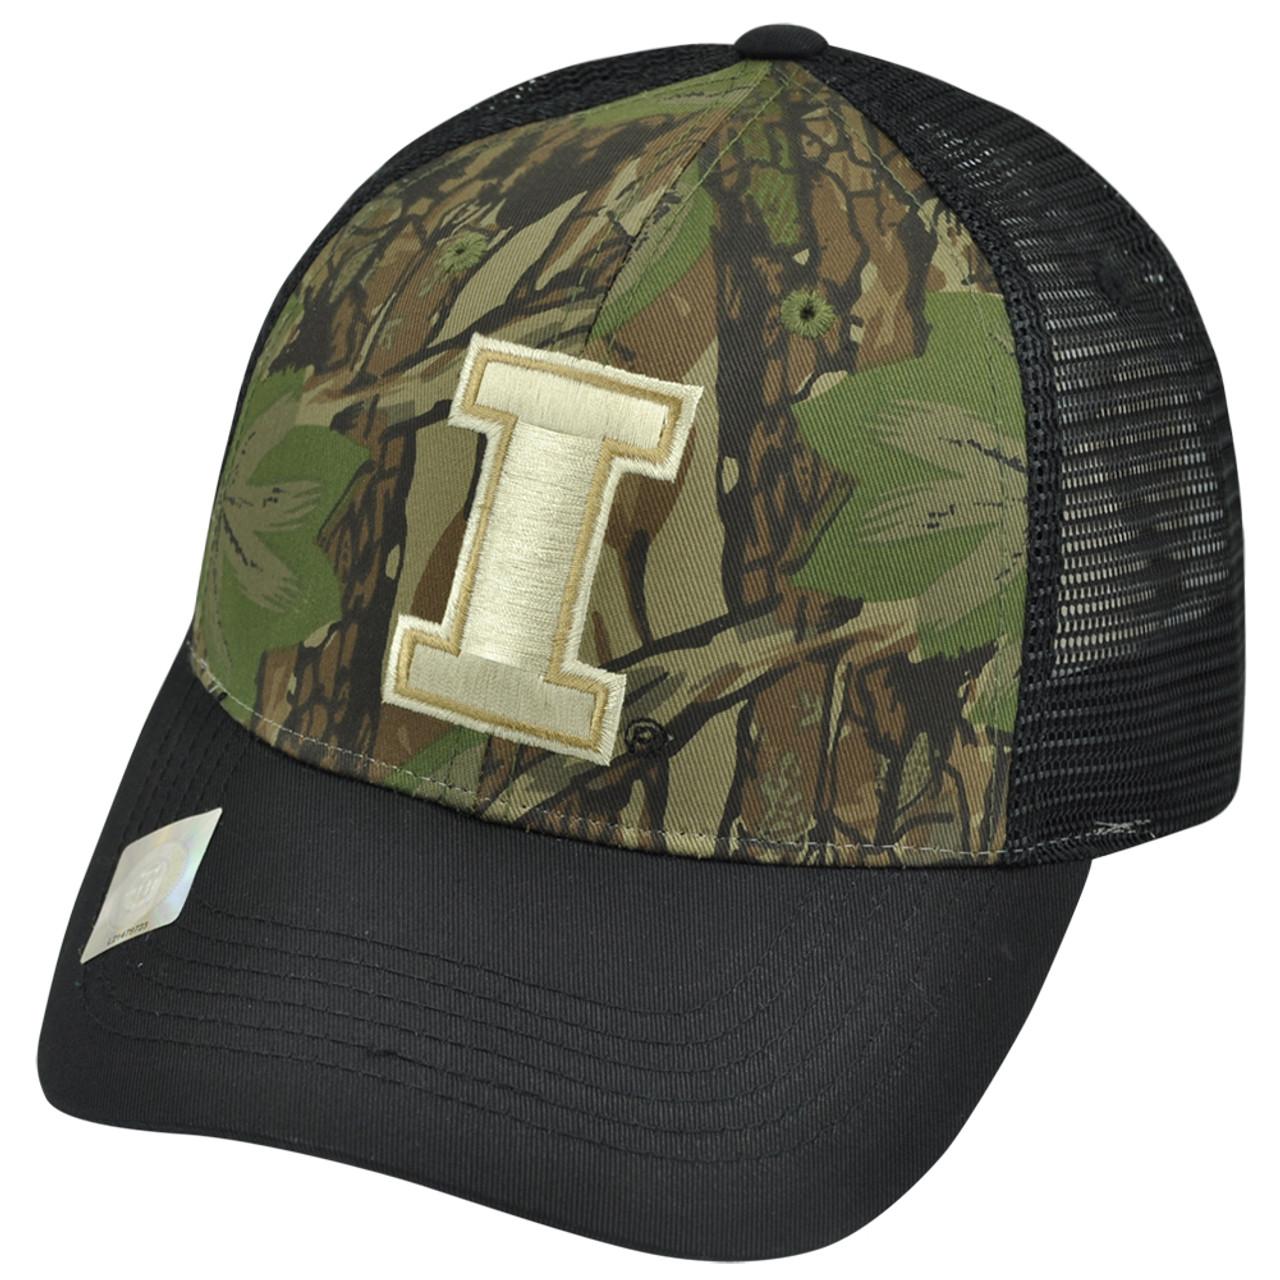 check out 5285f 7d226 NCAA Illinois Fighting Illini Freshman Trucker Camouflage Mesh Snapback Hat  Cap - Cap Store Online.com